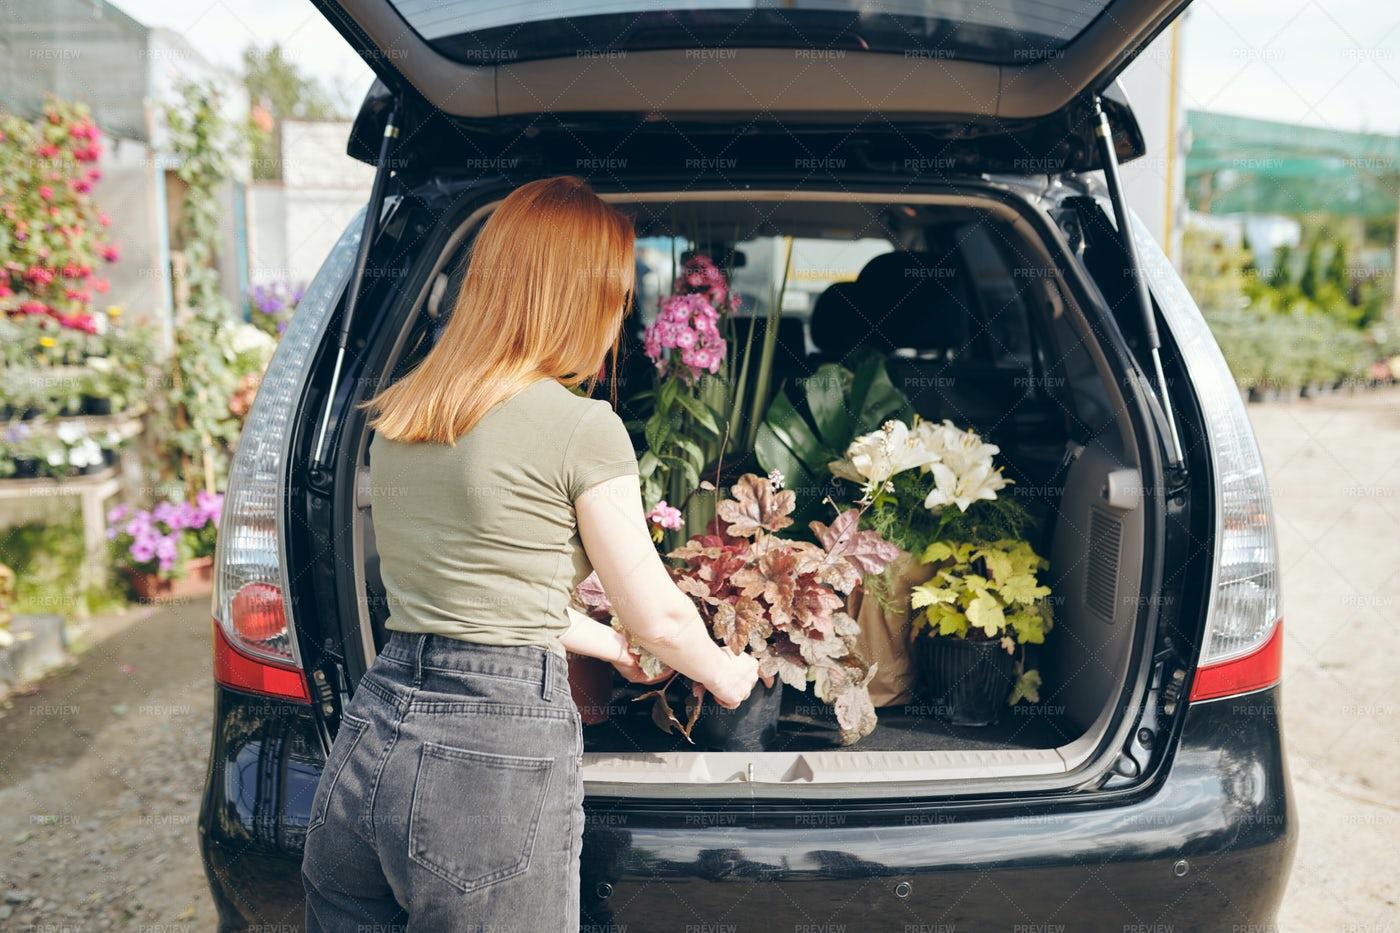 Loading Flowers Into Car: Stock Photos